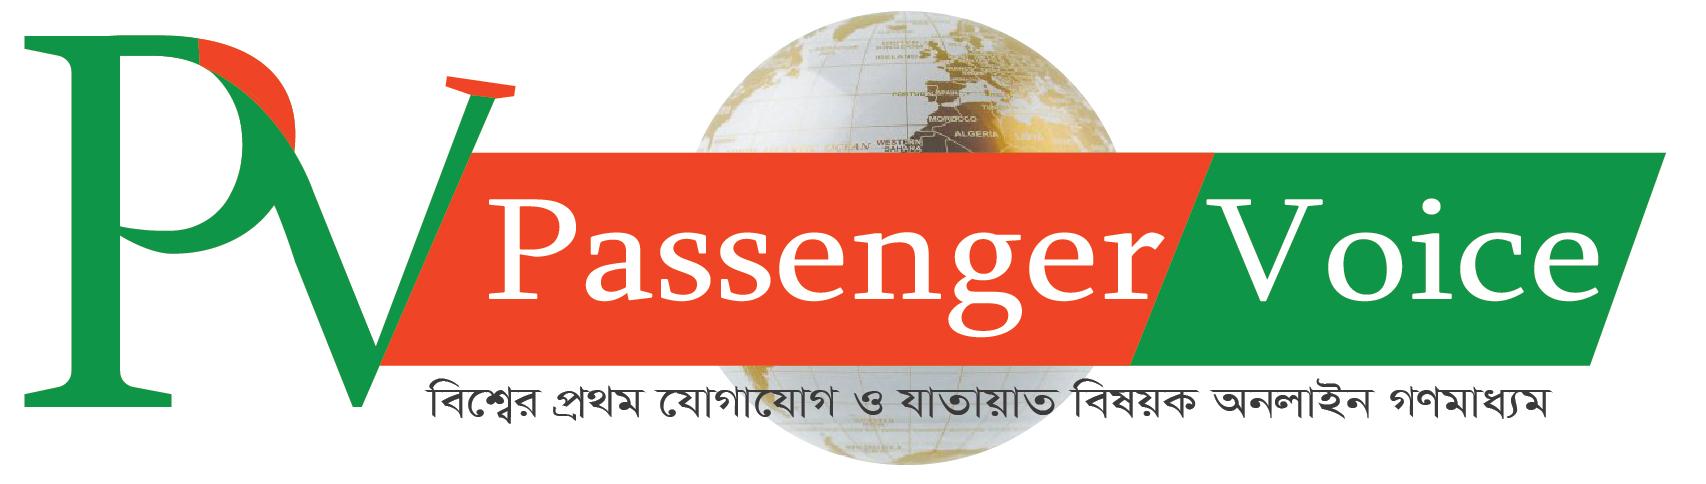 PassengerVoice